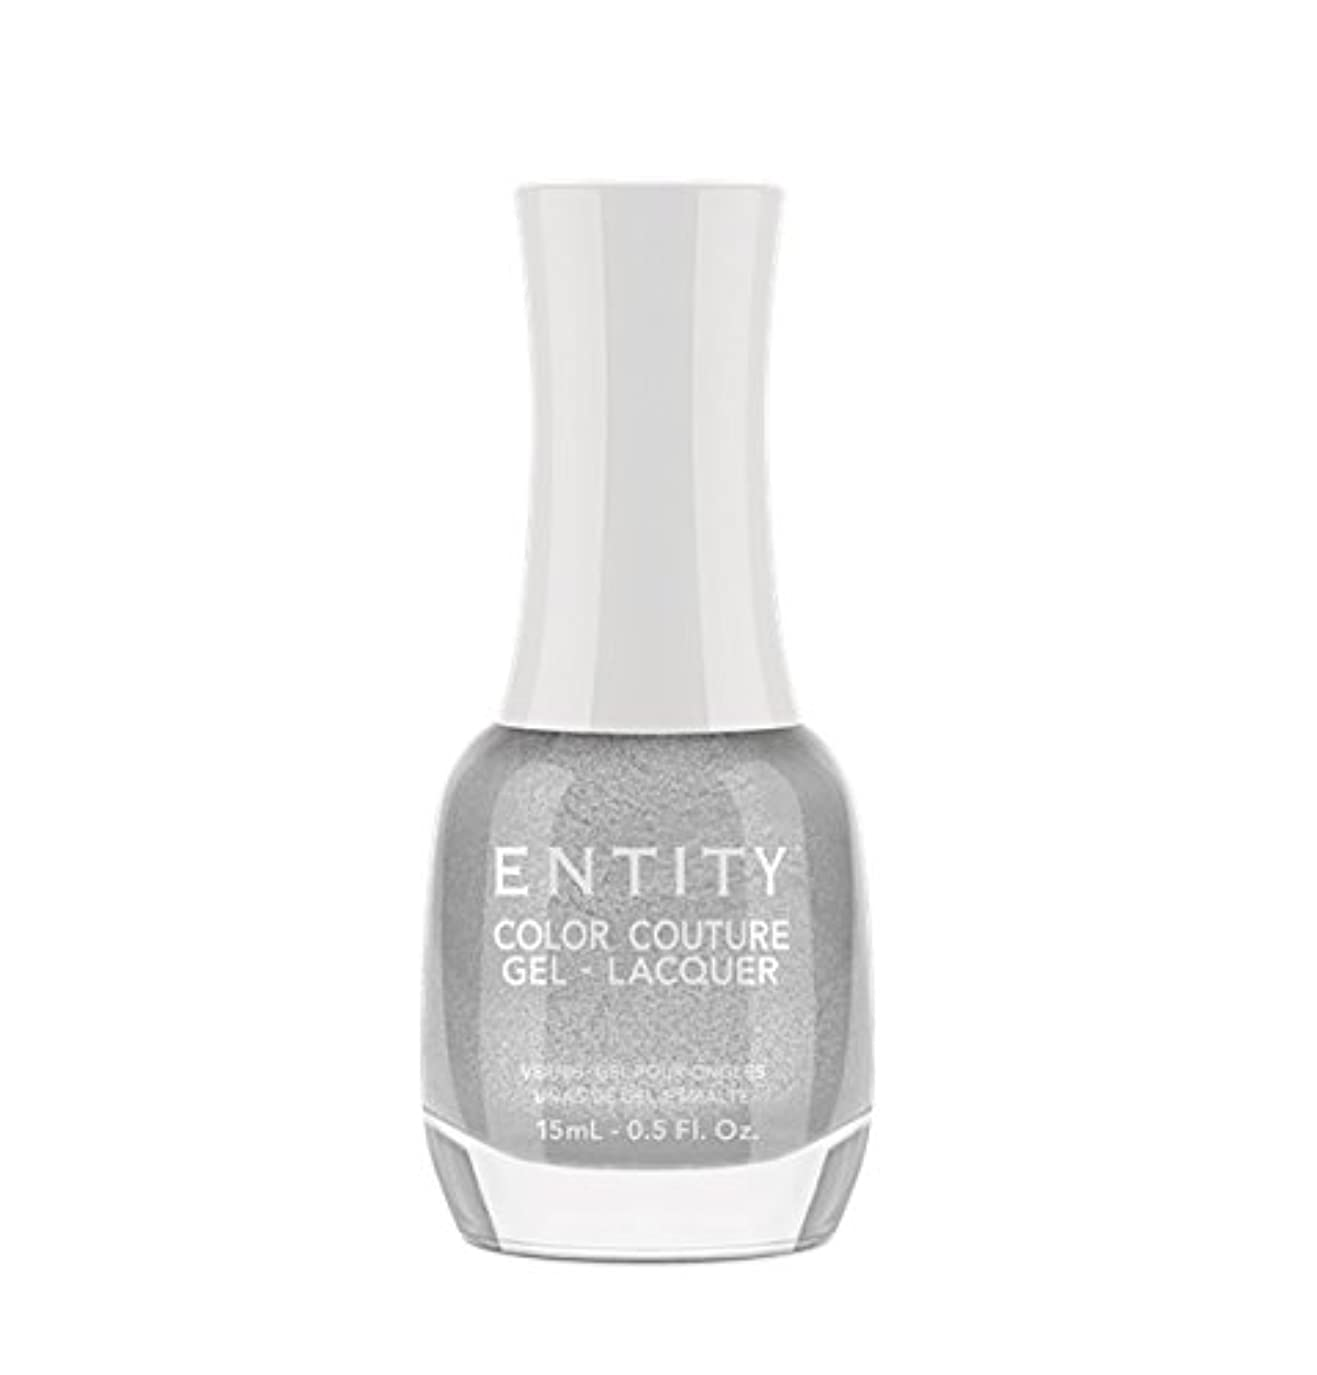 Entity Color Couture Gel-Lacquer - Contemporary Couture - 15 ml/0.5 oz